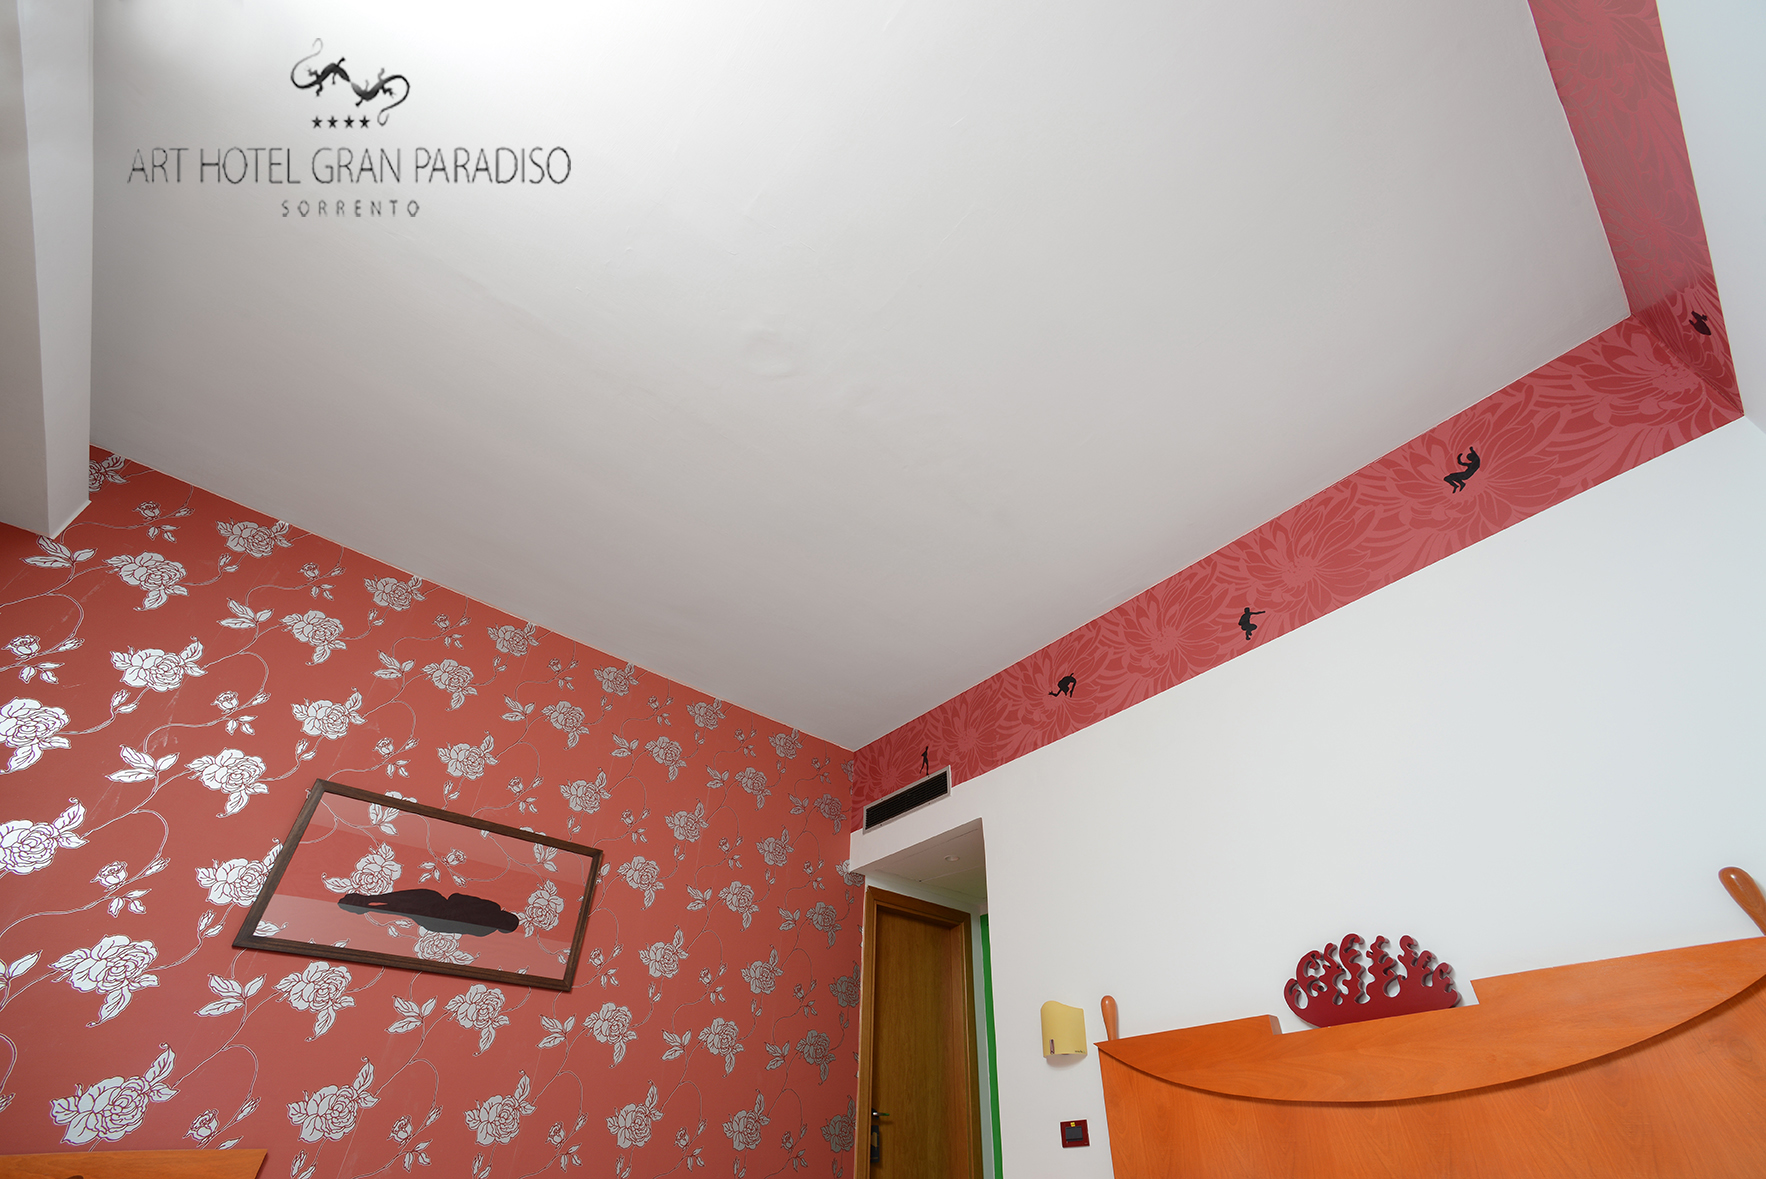 Art_Hotel_Gran_Paradiso_2013_311_Donatella_Spaziani_6.jpg